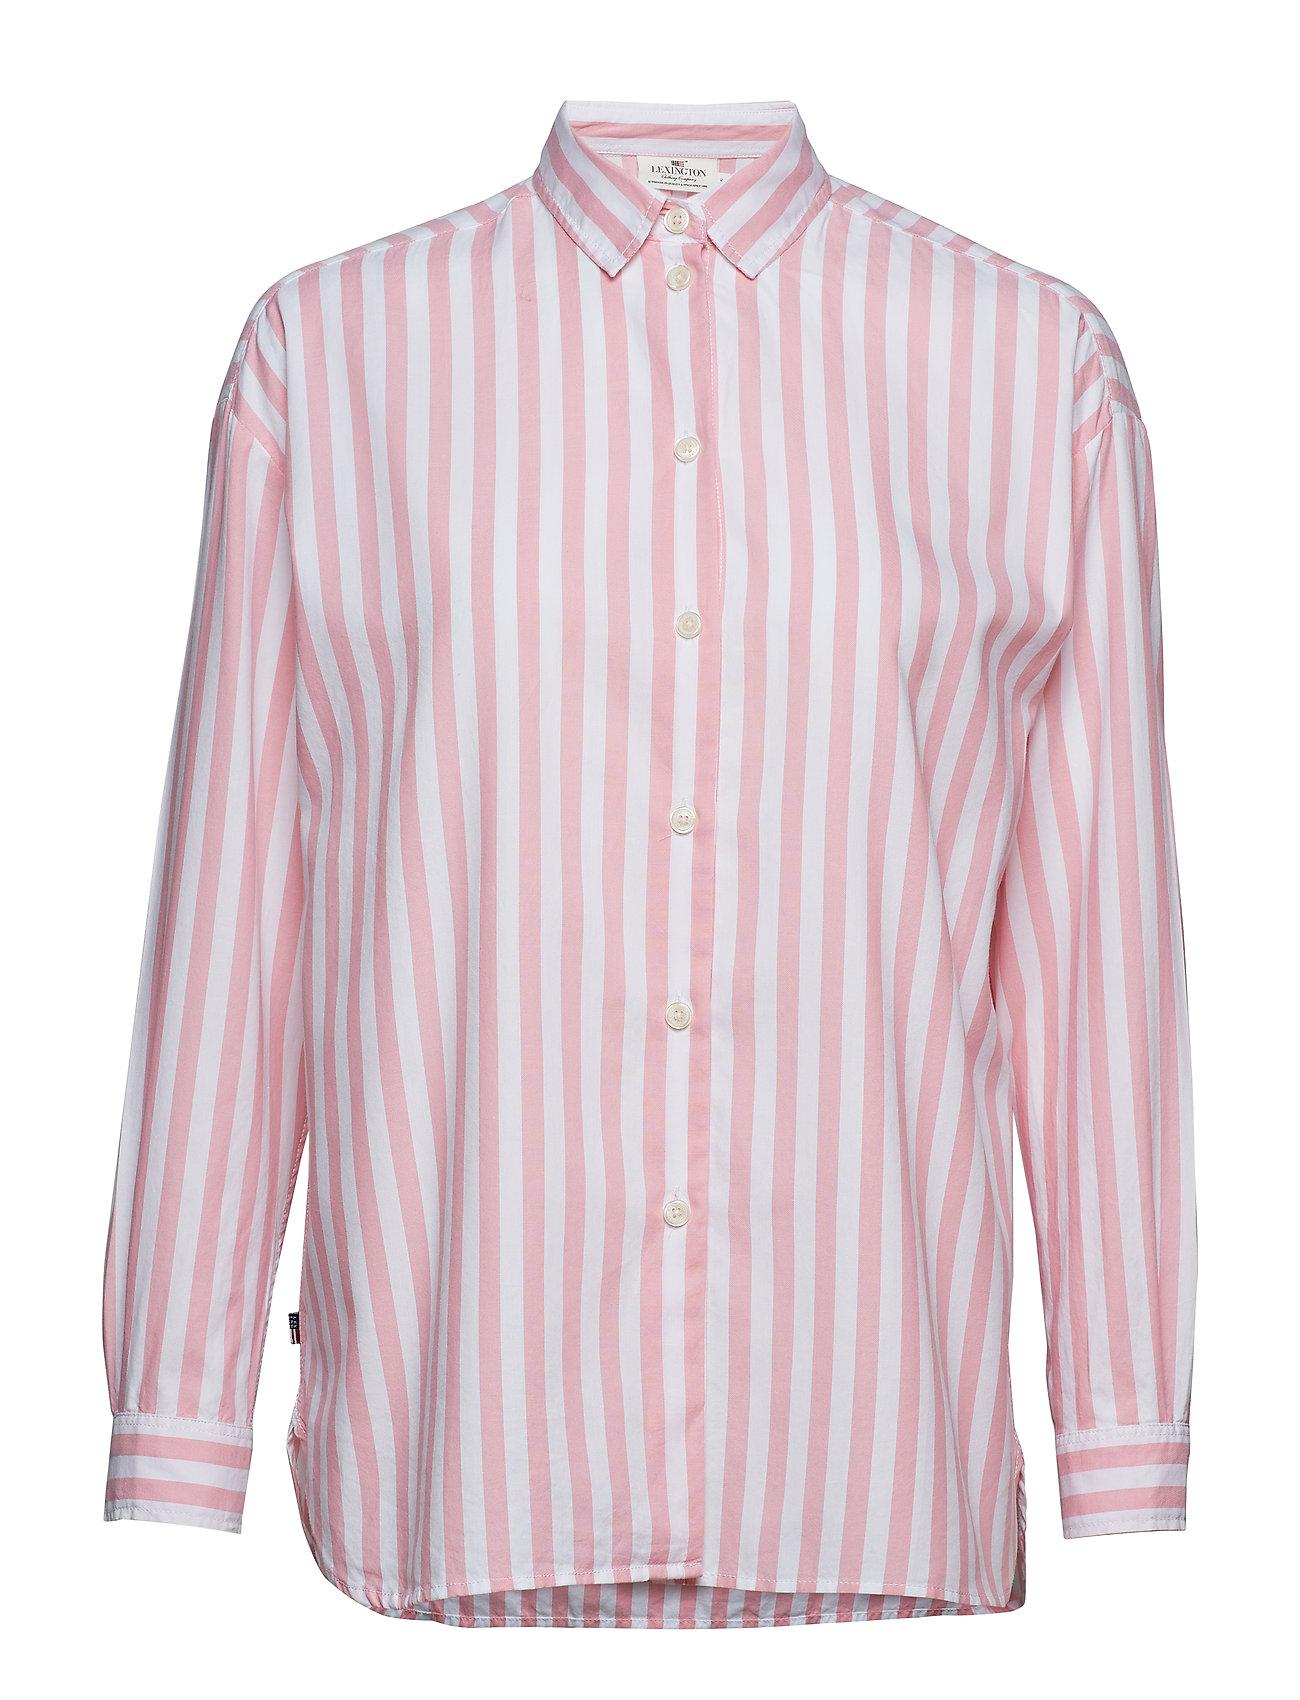 Lexington Clothing Edith Lt Oxford Shirt - PINK/WHITE STRIPE